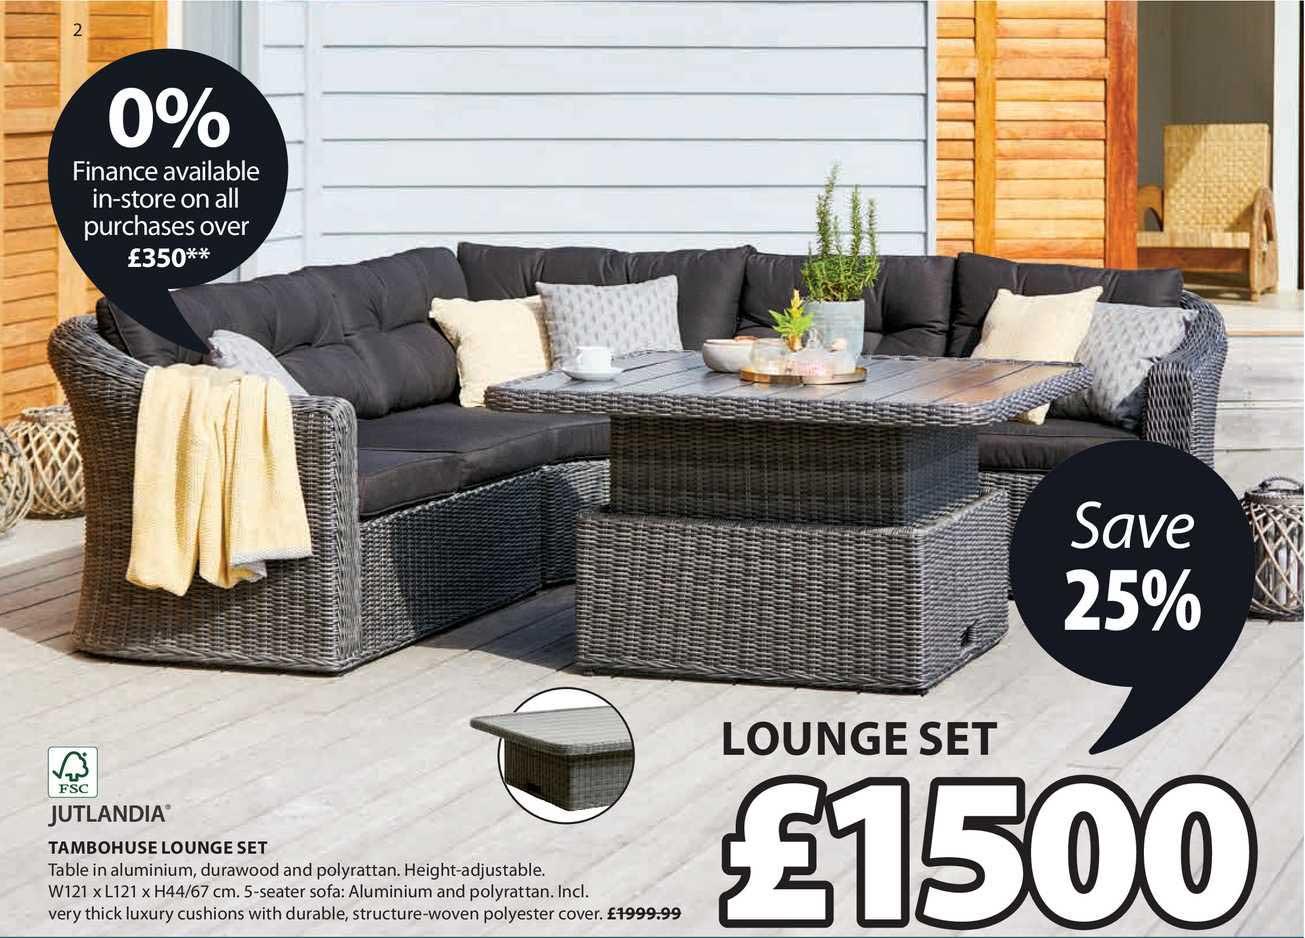 JYSK Jutlandia Tambohuse Lounge Set